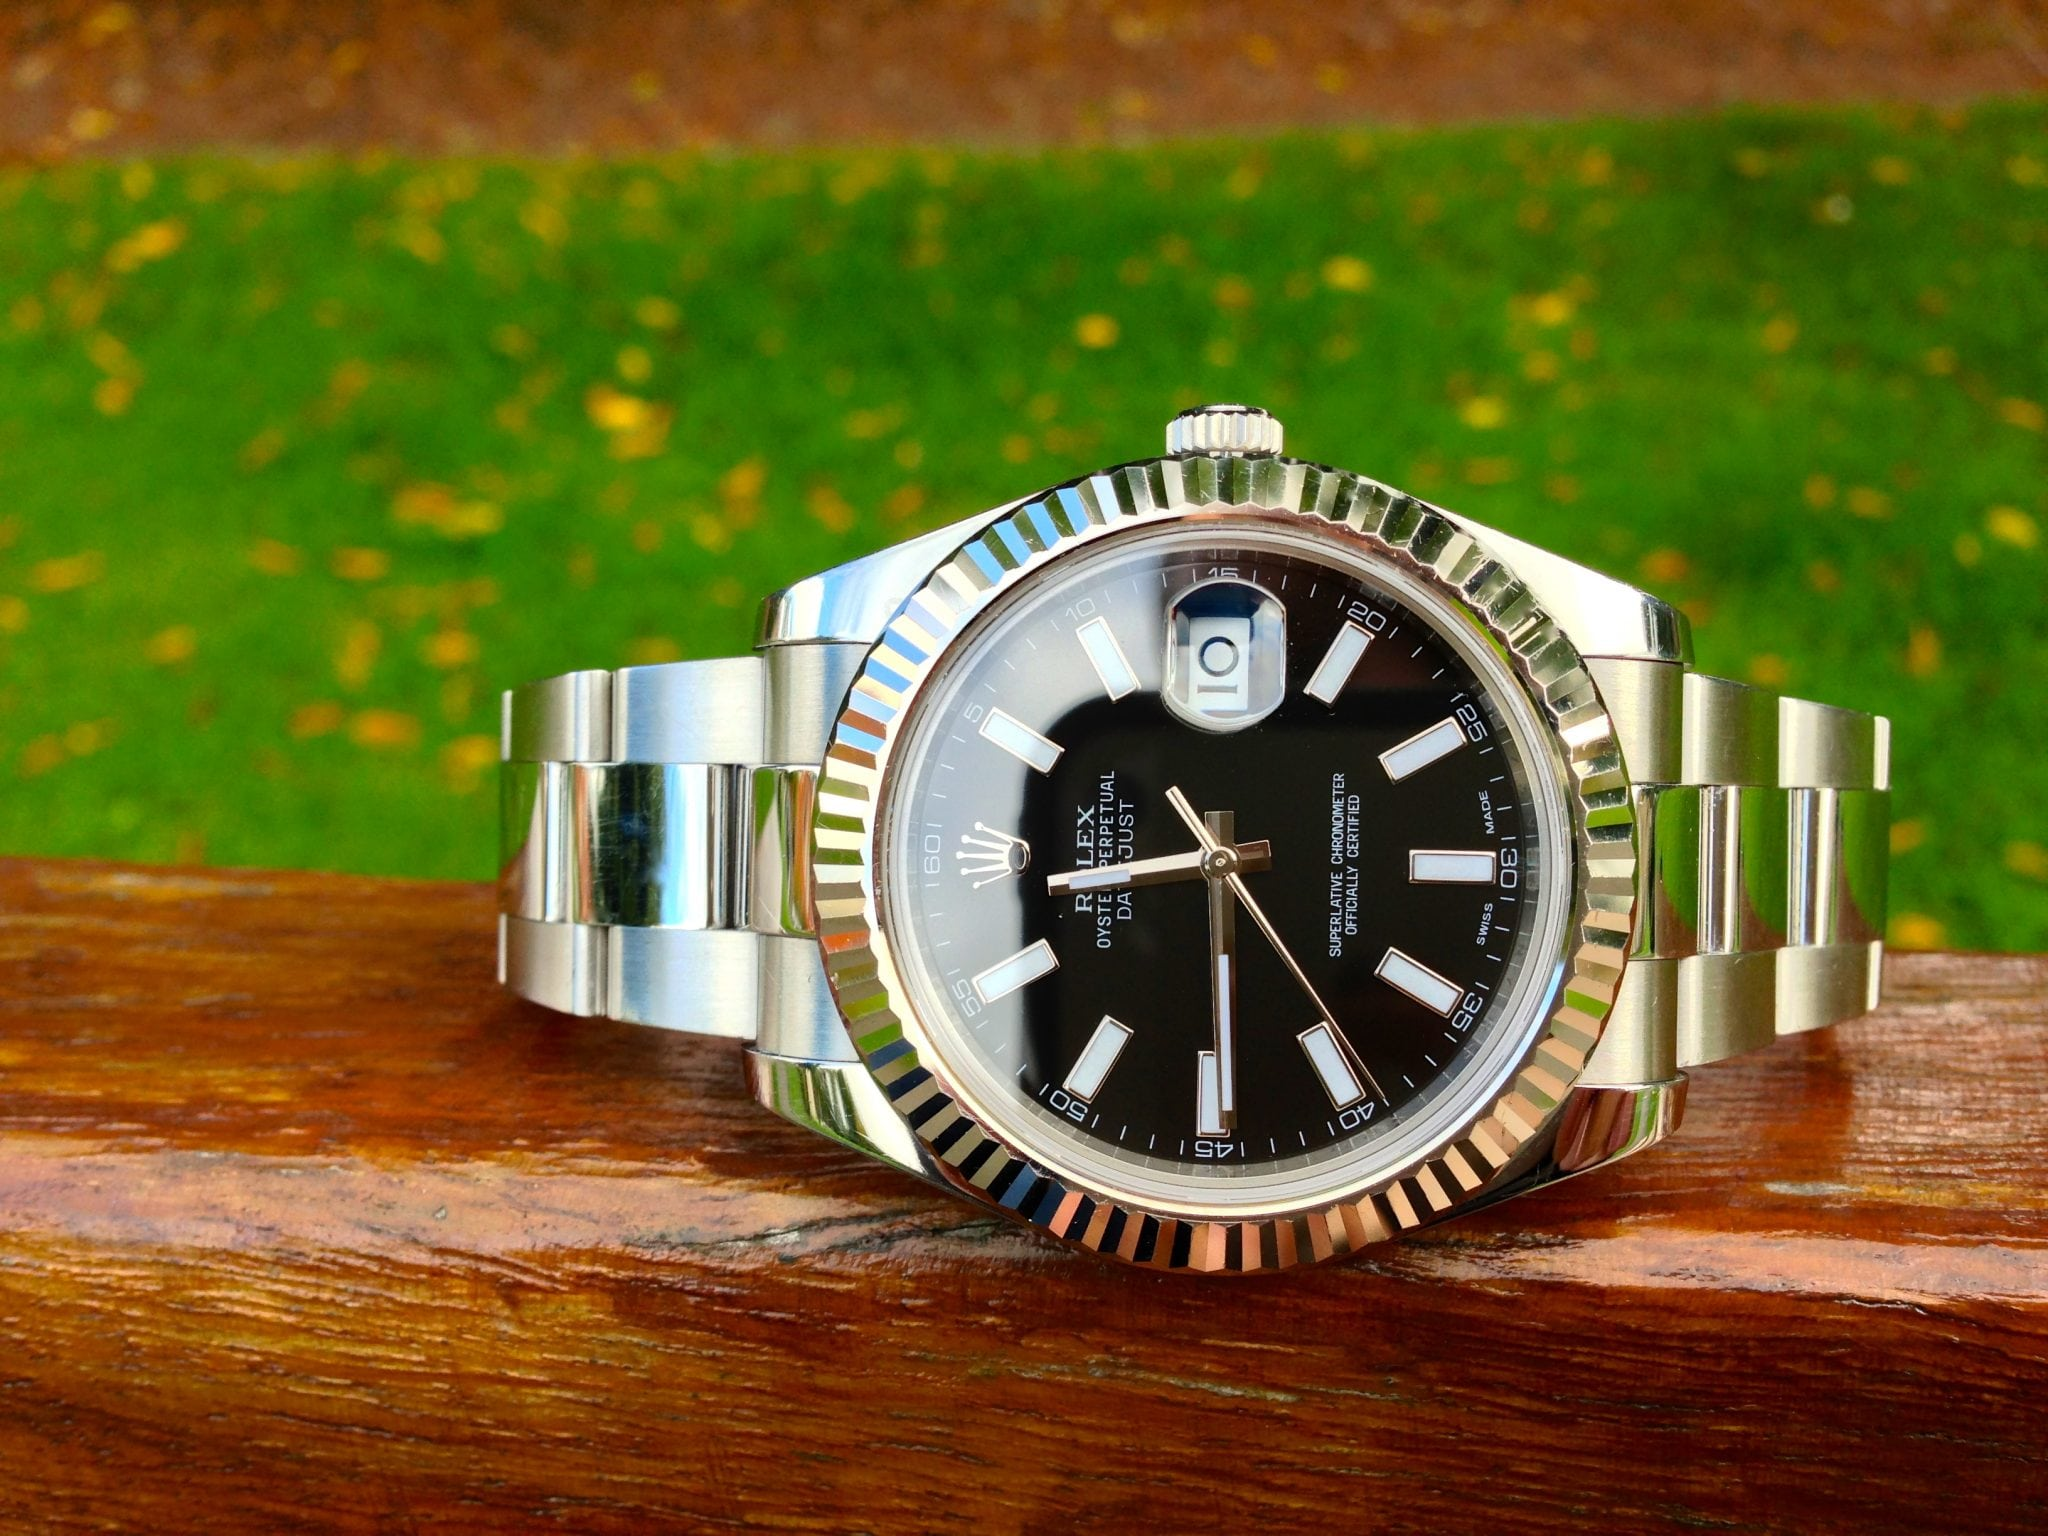 Rolex Datejust 2 large size''41mm'' ref 116334